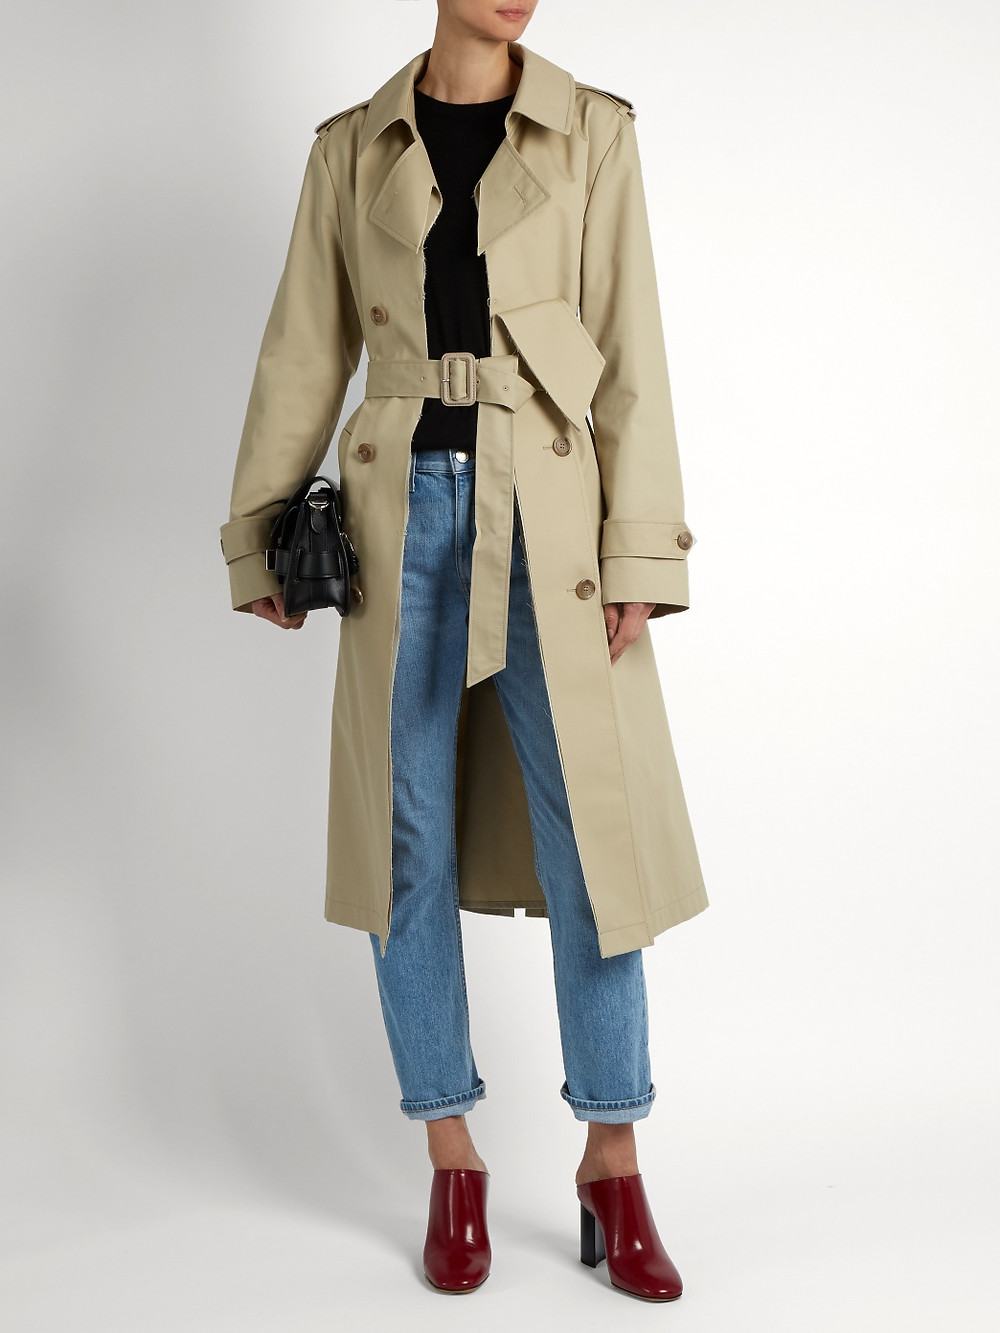 Maison Margiela Water-repellent trench coat $794